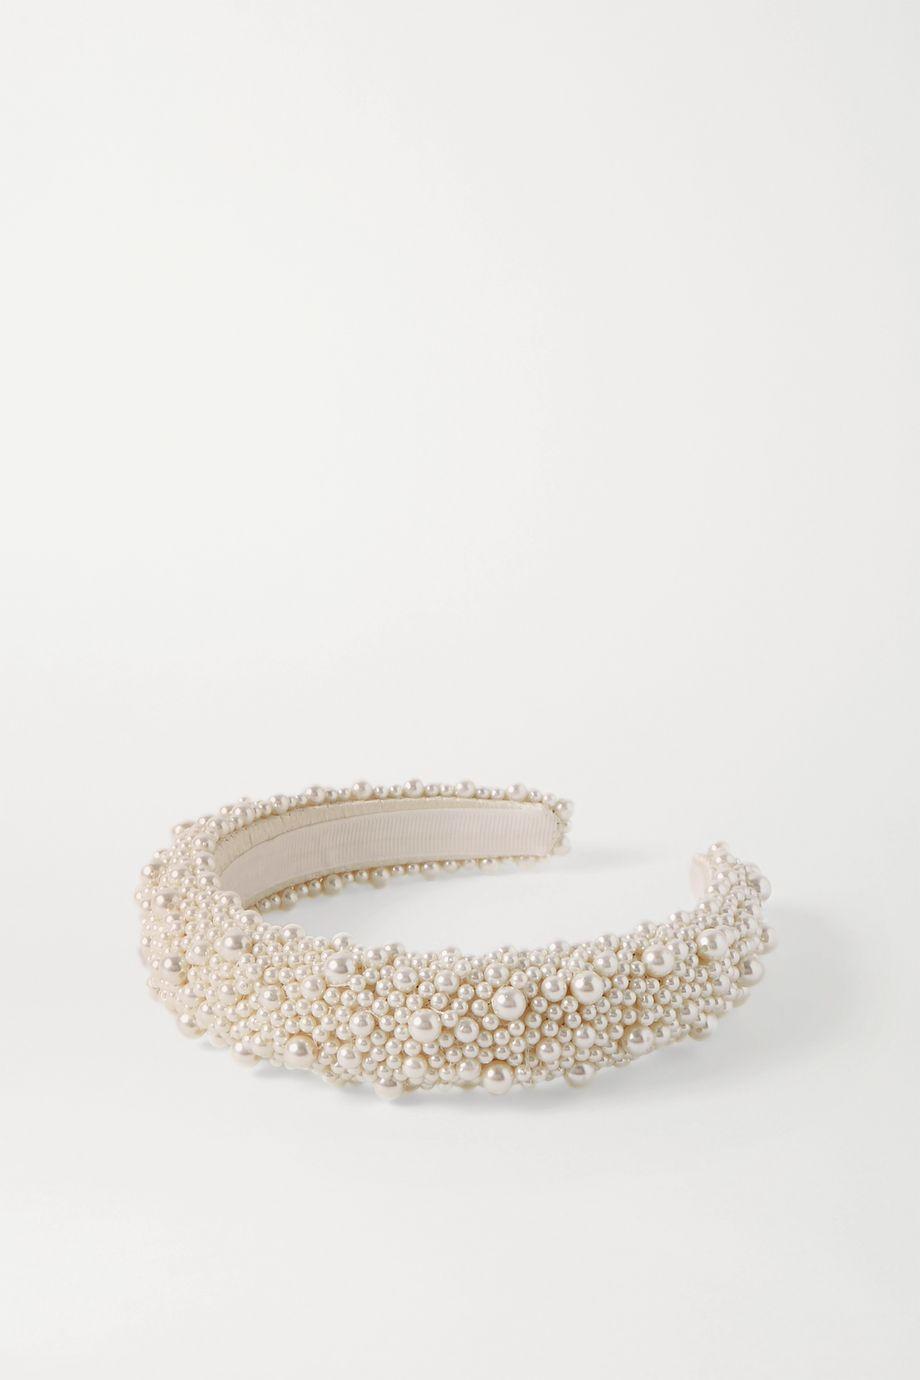 Jennifer Behr Bailey faux pearl-embellished satin headband